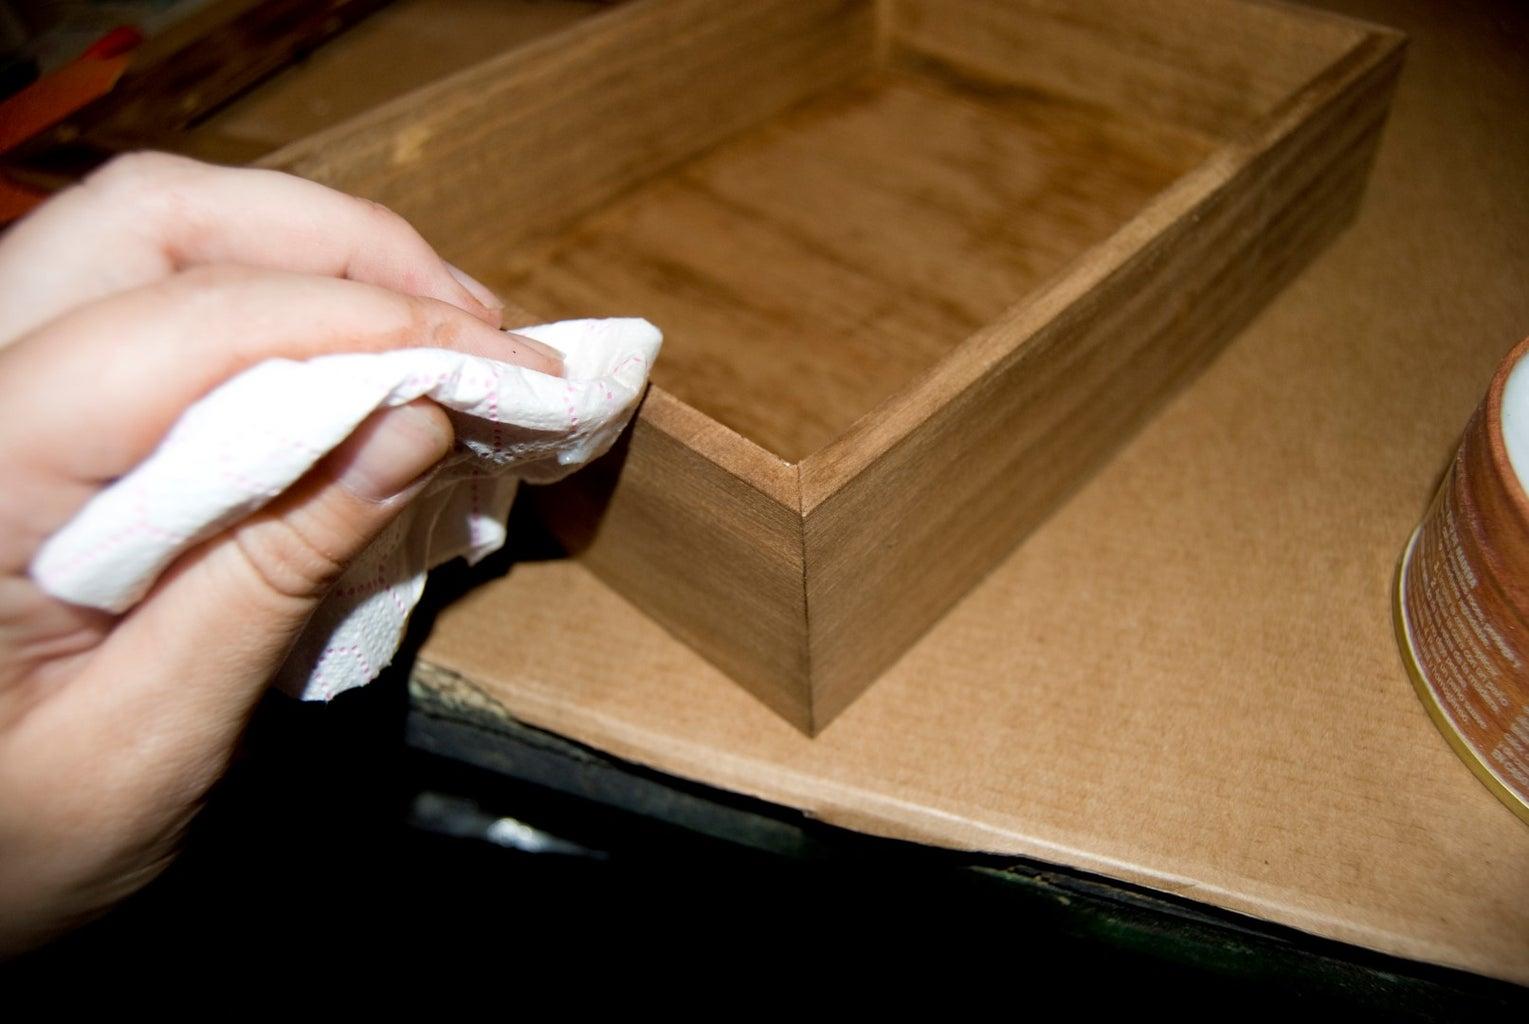 Step 5: Wax